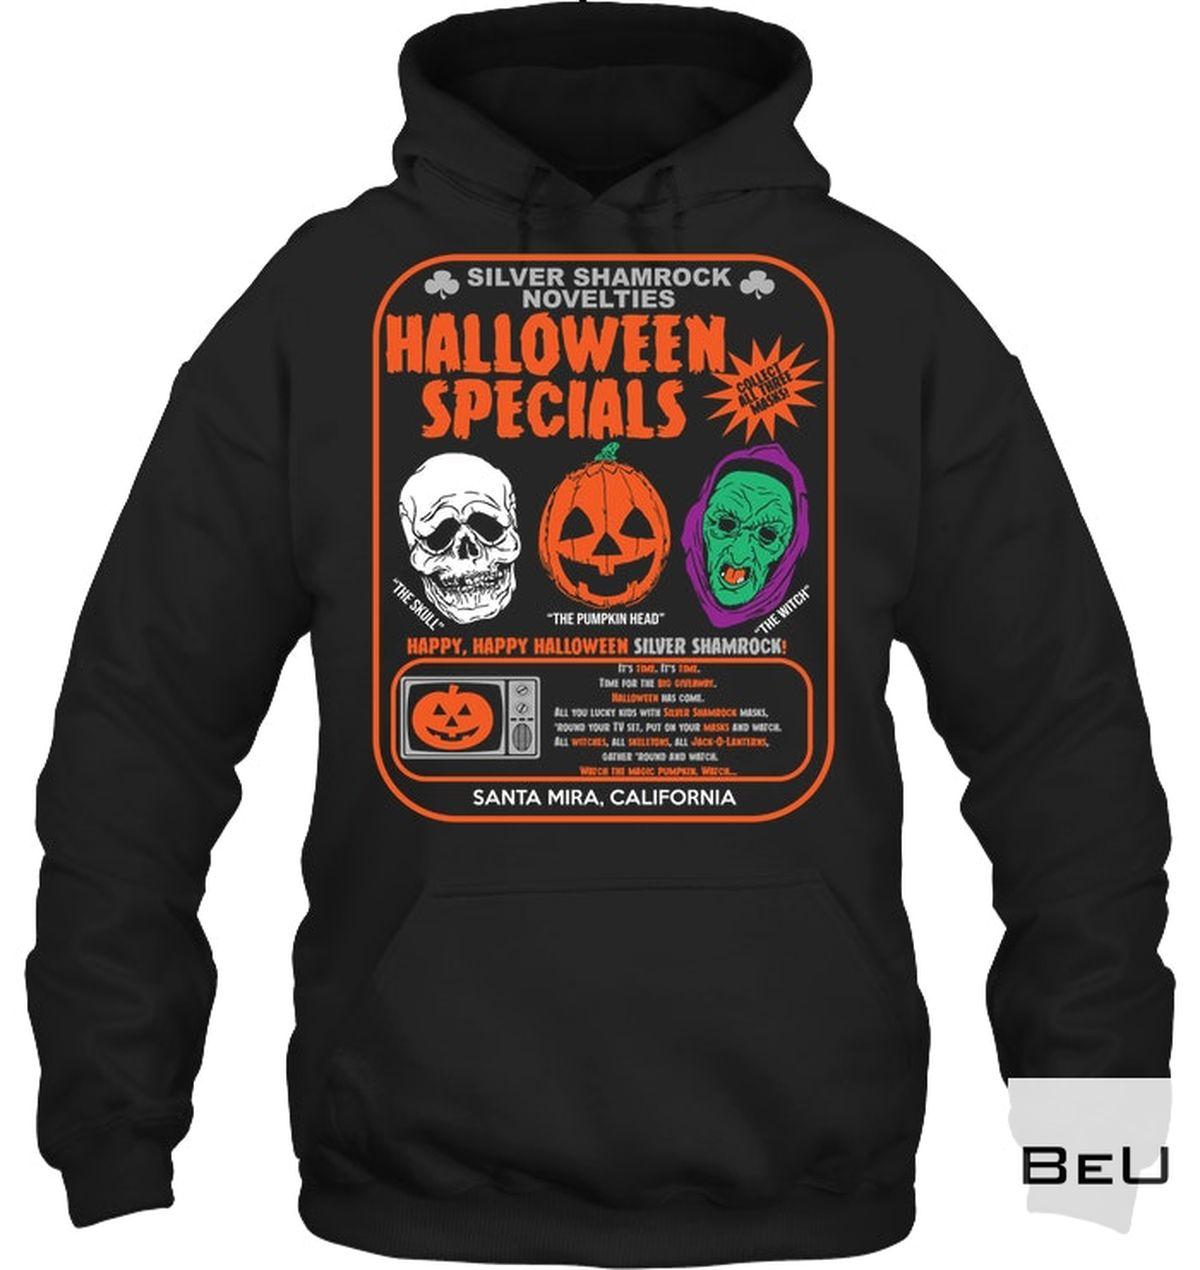 Father's Day Gift Silver Shamrock Novelties Halloween Specials Shirt